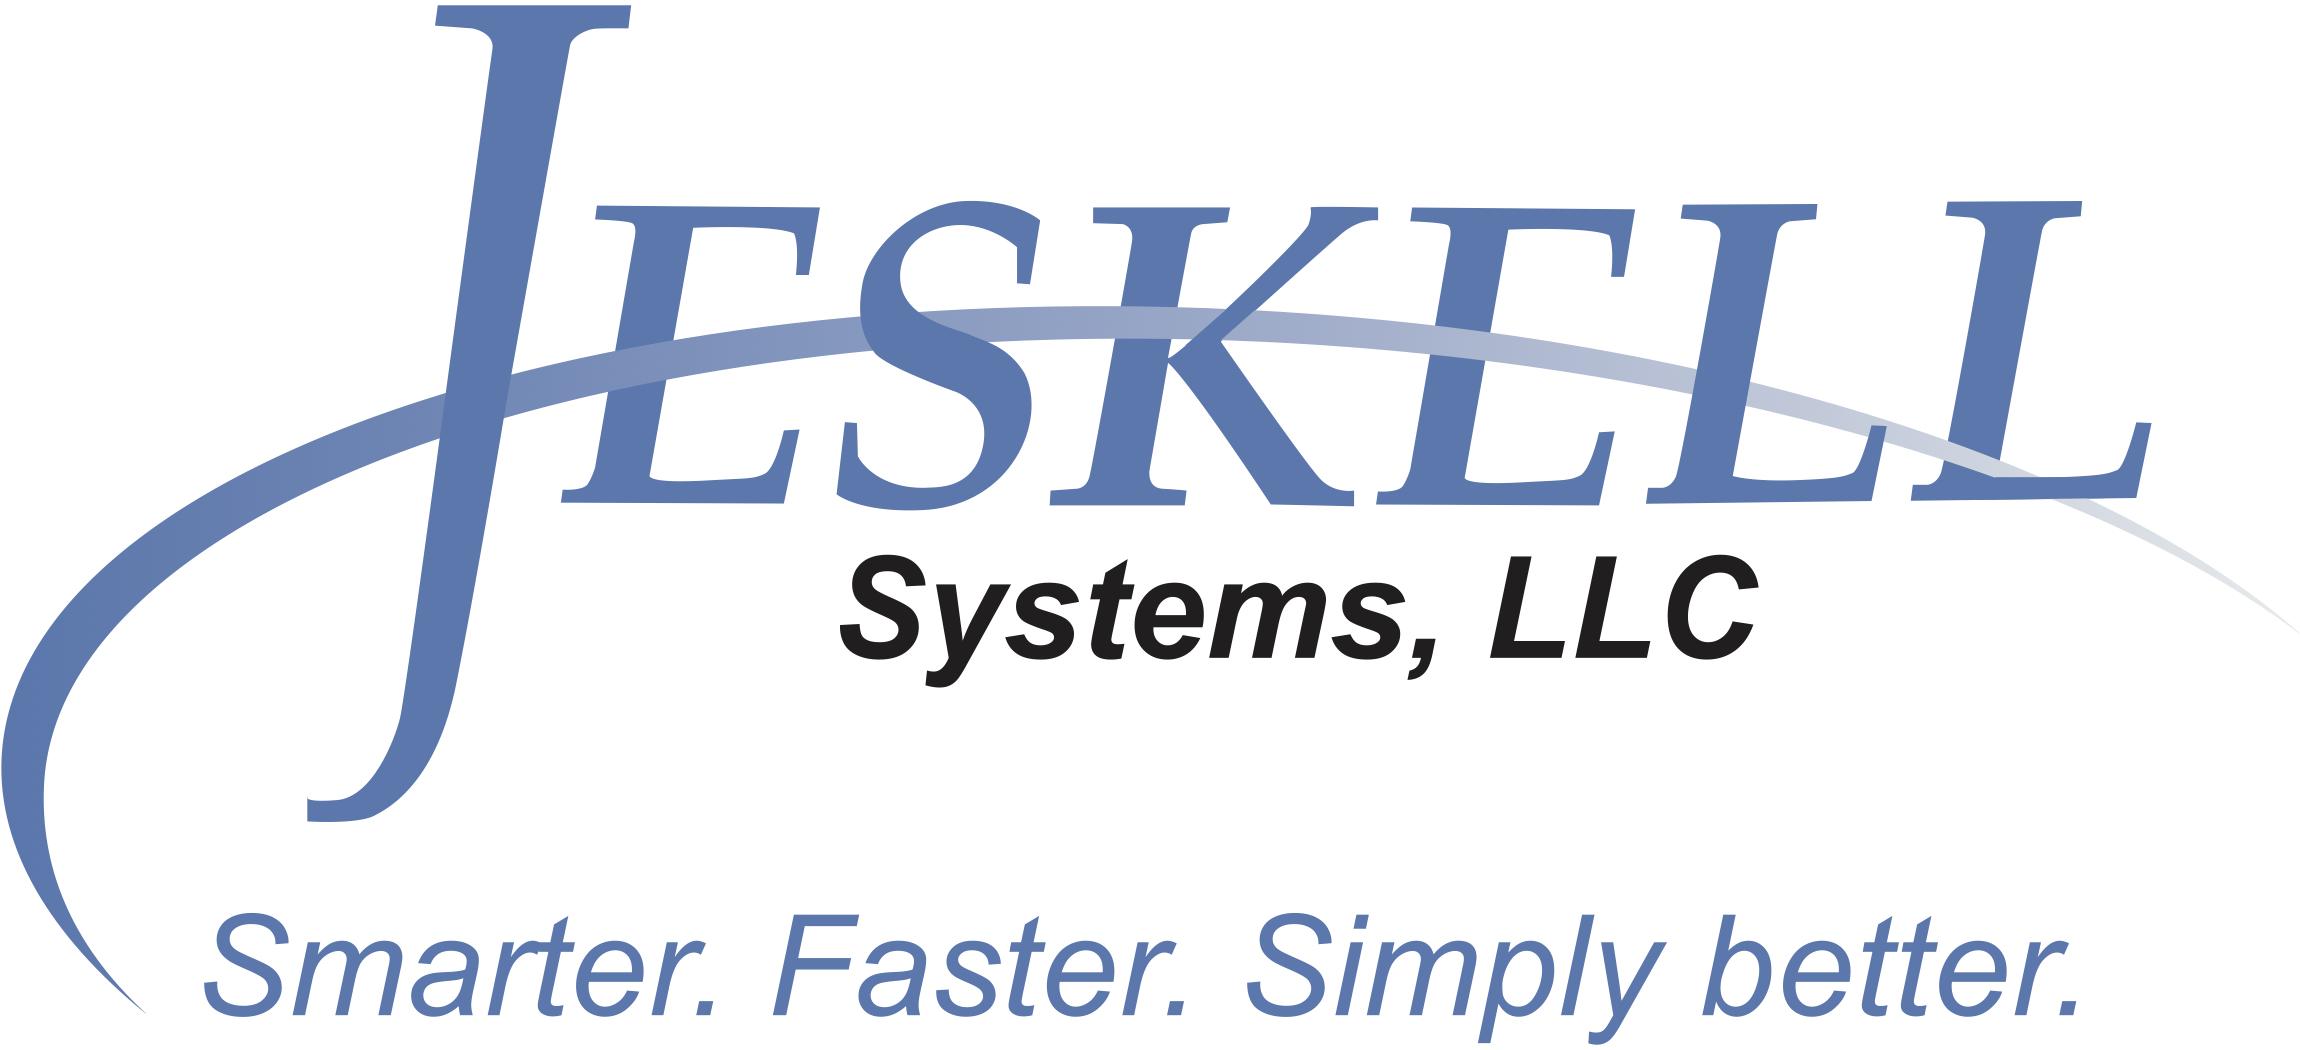 Jeskell  logo